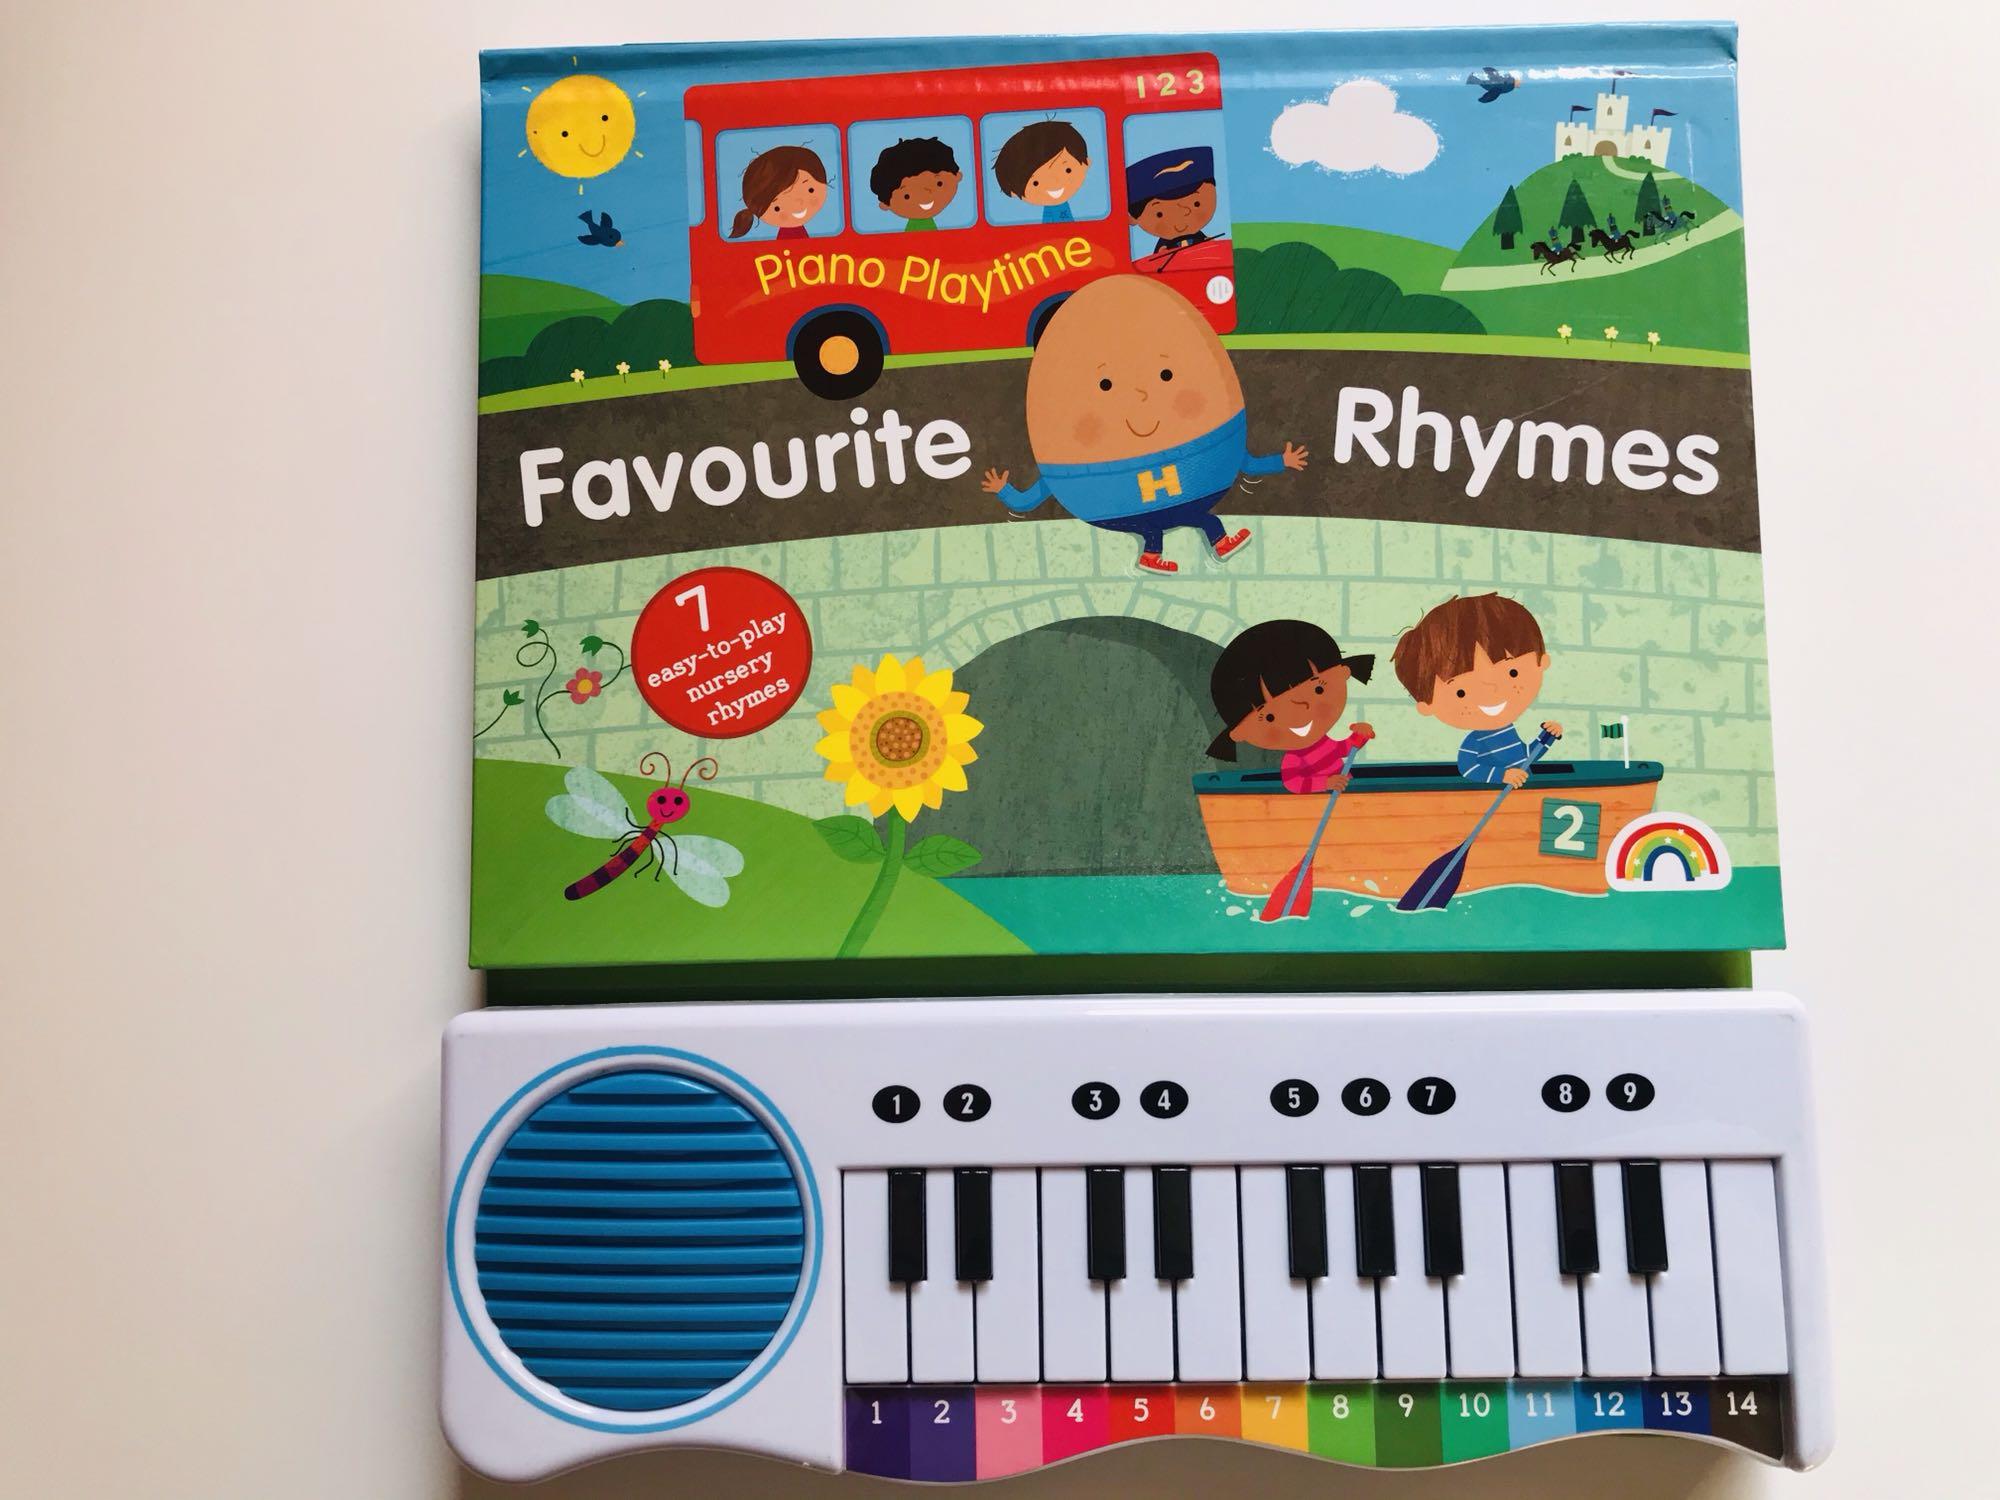 Favourife rhymes 英文钢琴书纸板7首钢琴儿童玩具书